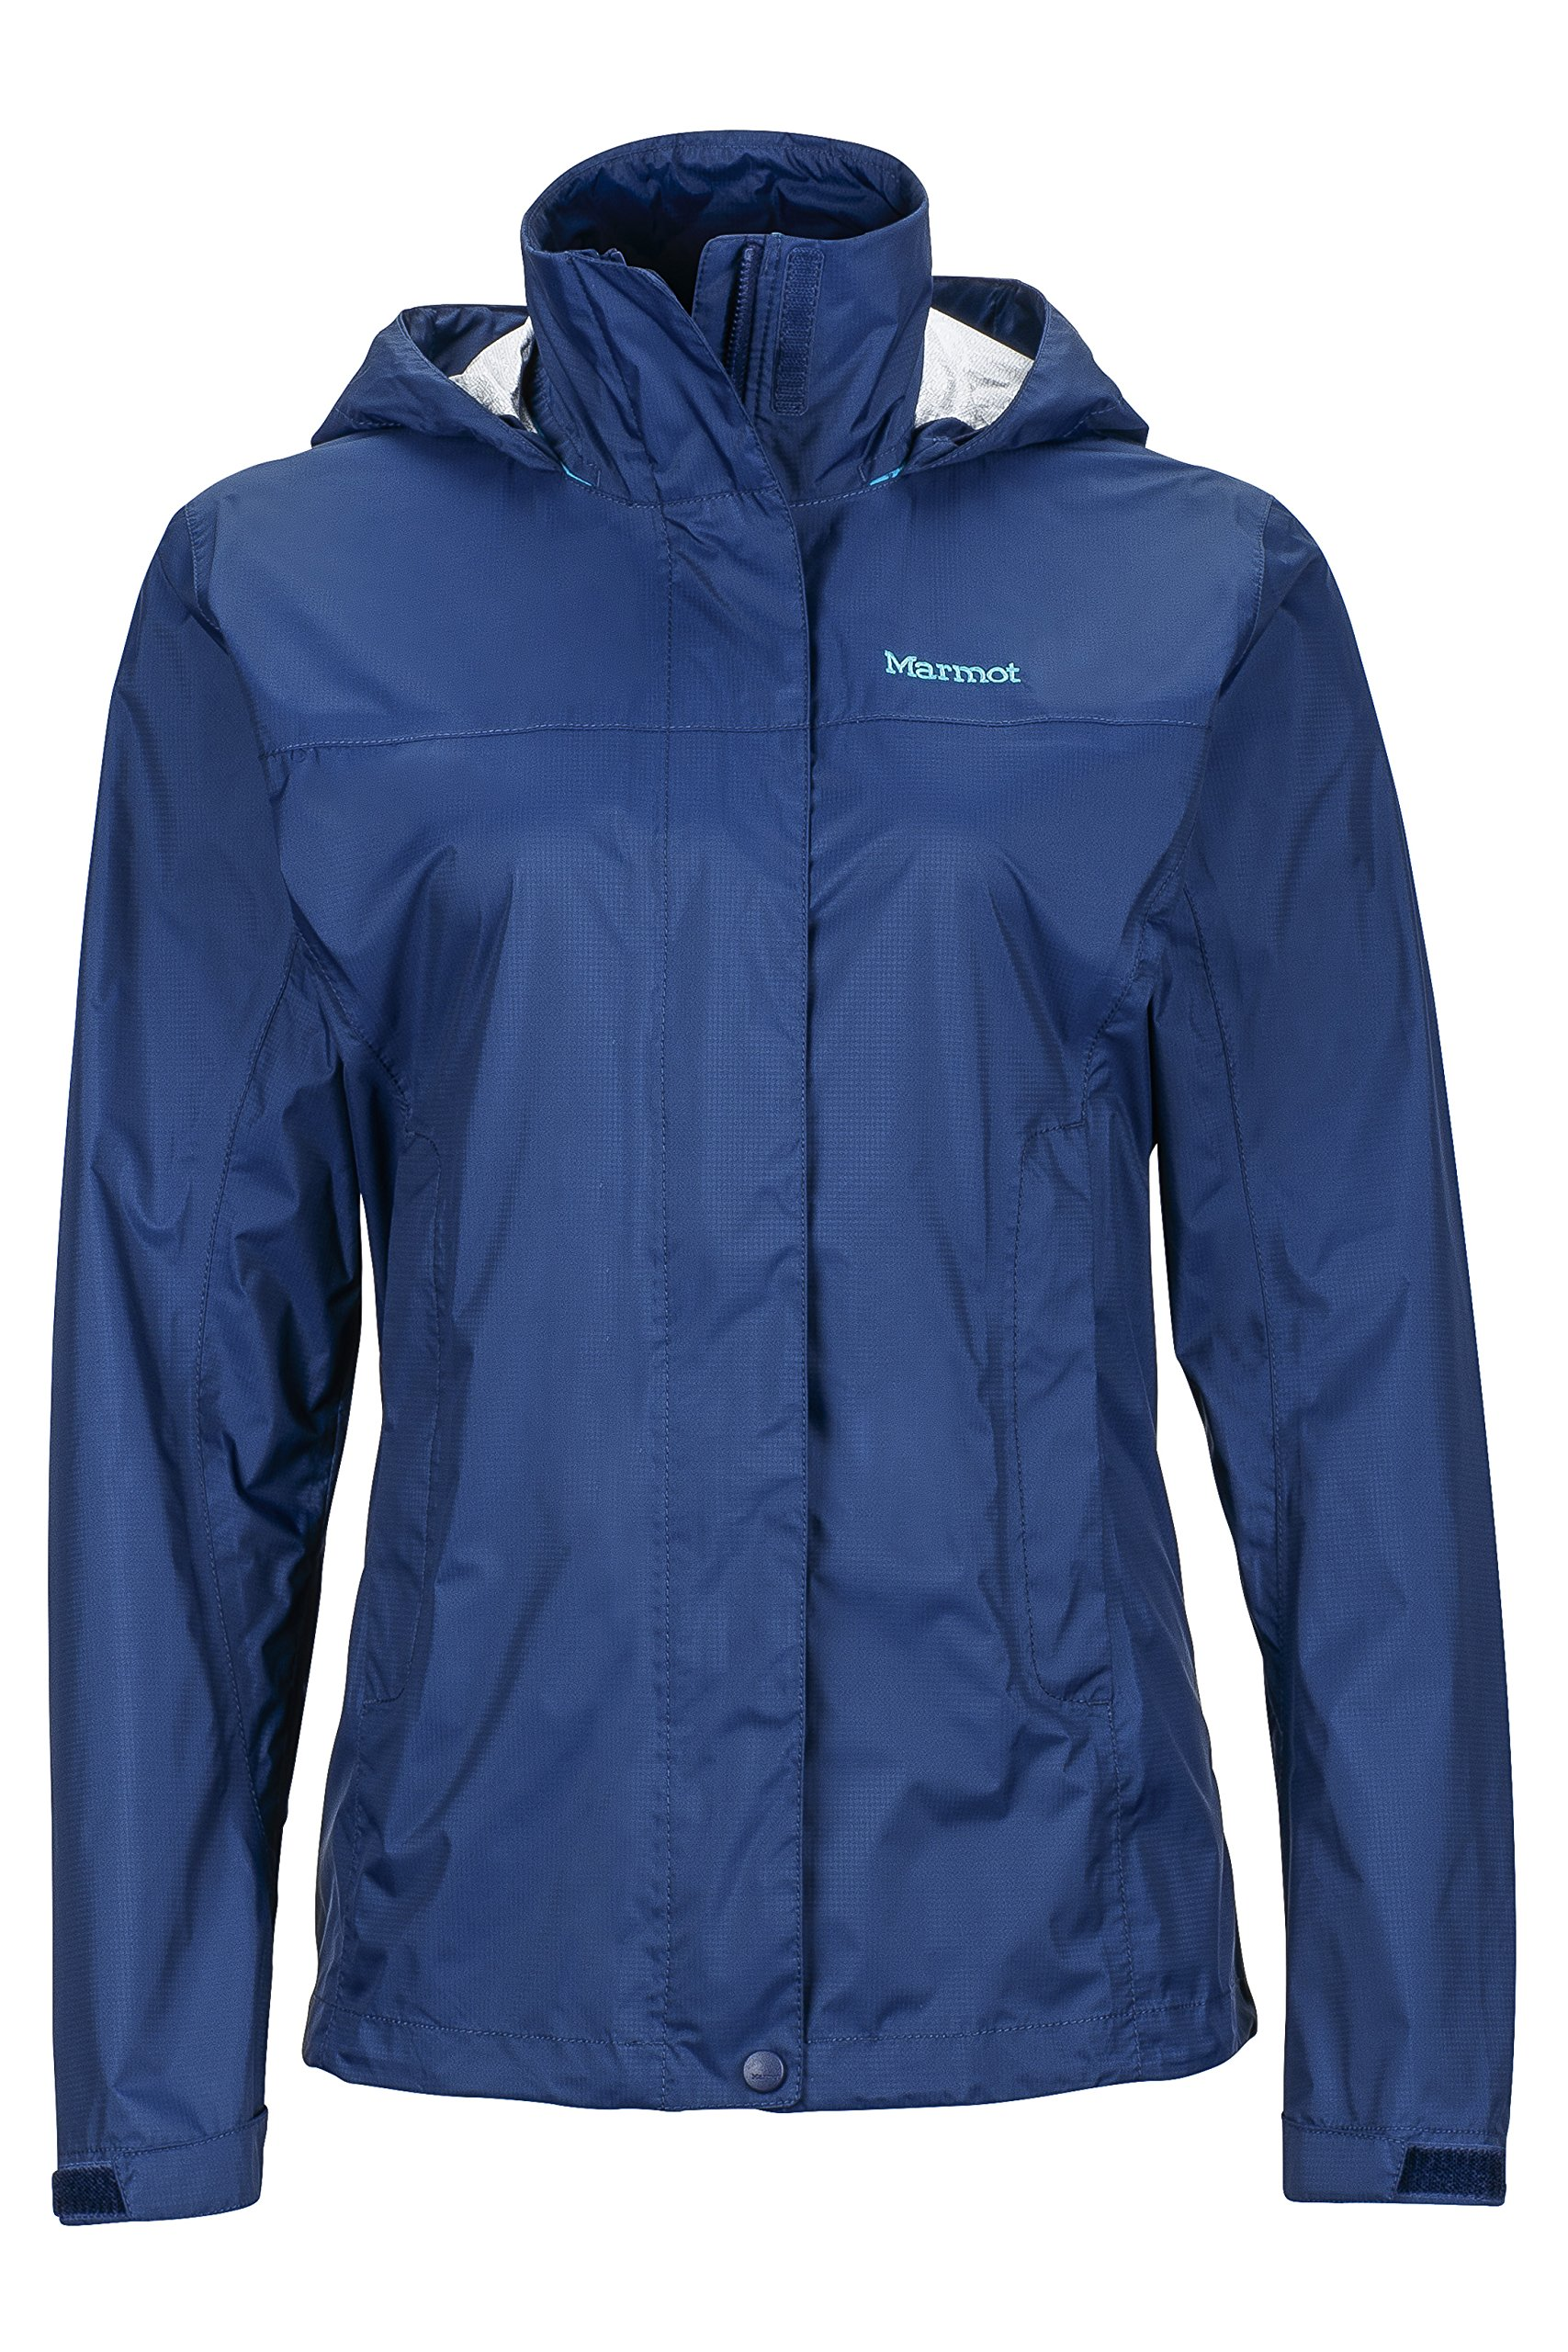 Marmot PreCip Women's Lightweight Waterproof Rain Jacket, Arctic Navy, X-Small